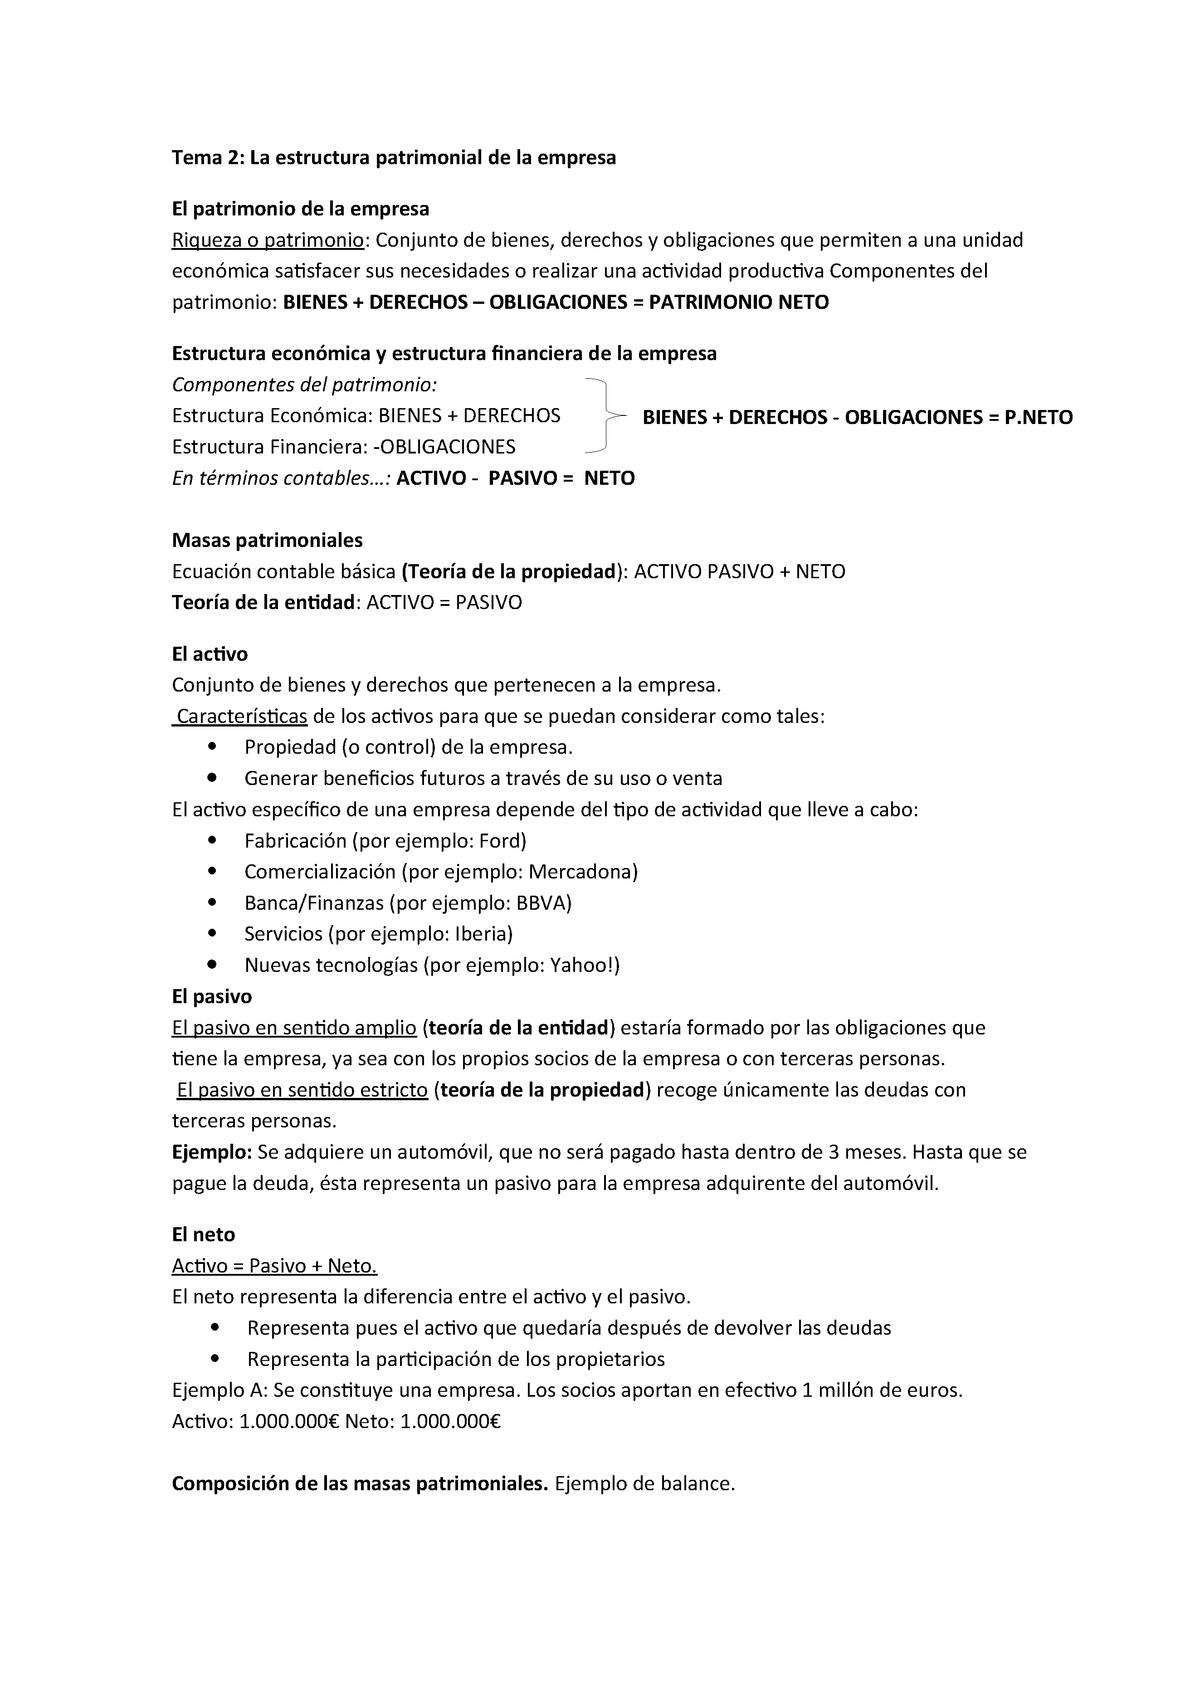 Tema 2 La Estructura Patrimonial De La Empresa 202 13638